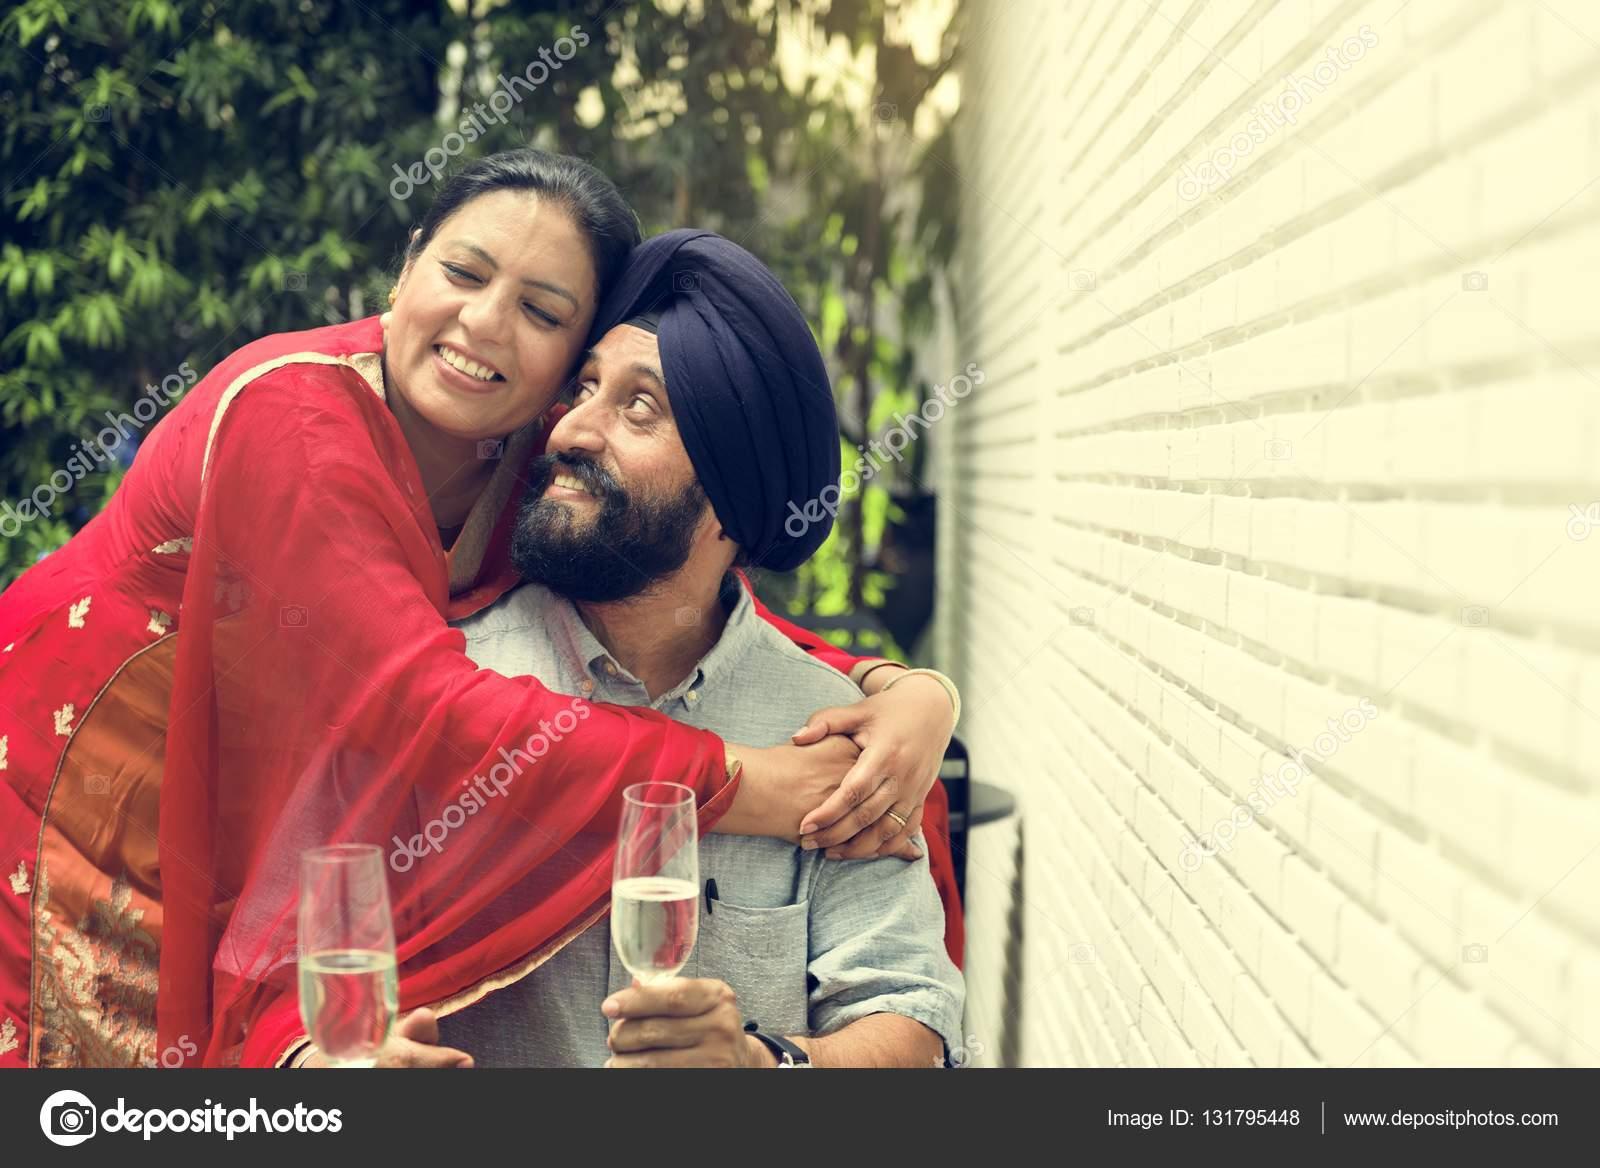 Freie Liebe Dating in Indien